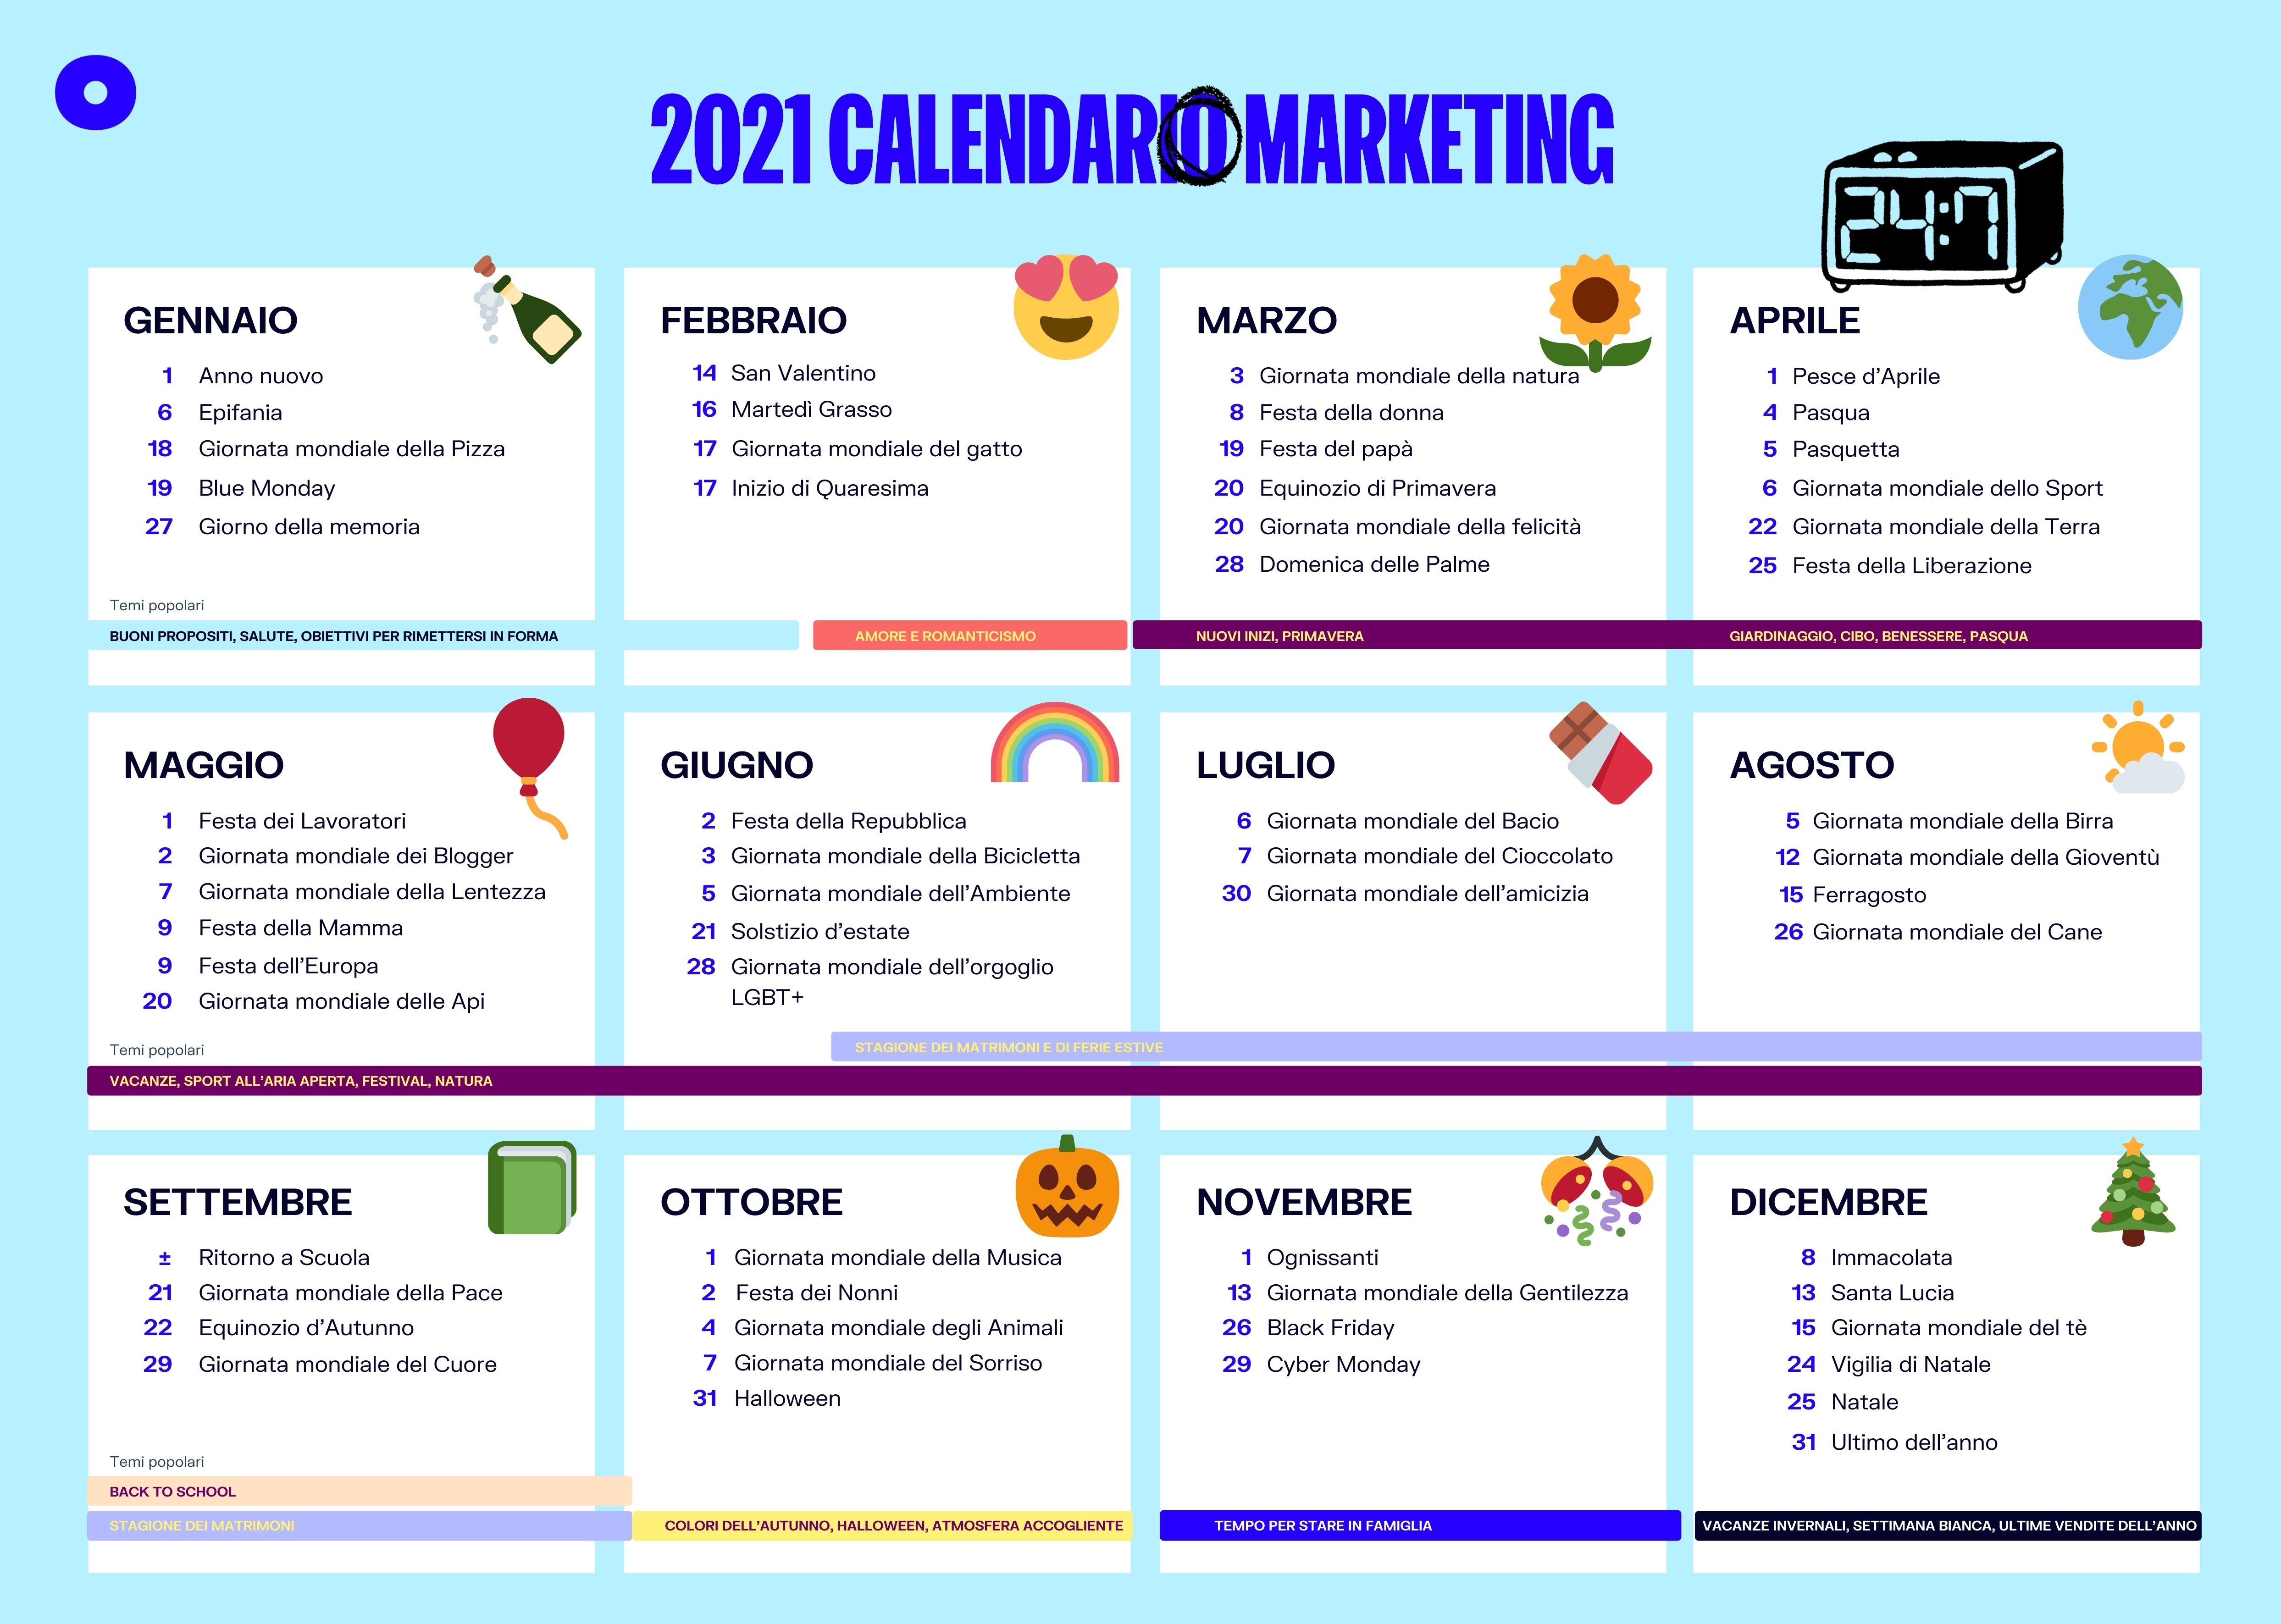 Calendario ecommerce 2021 Oberlo